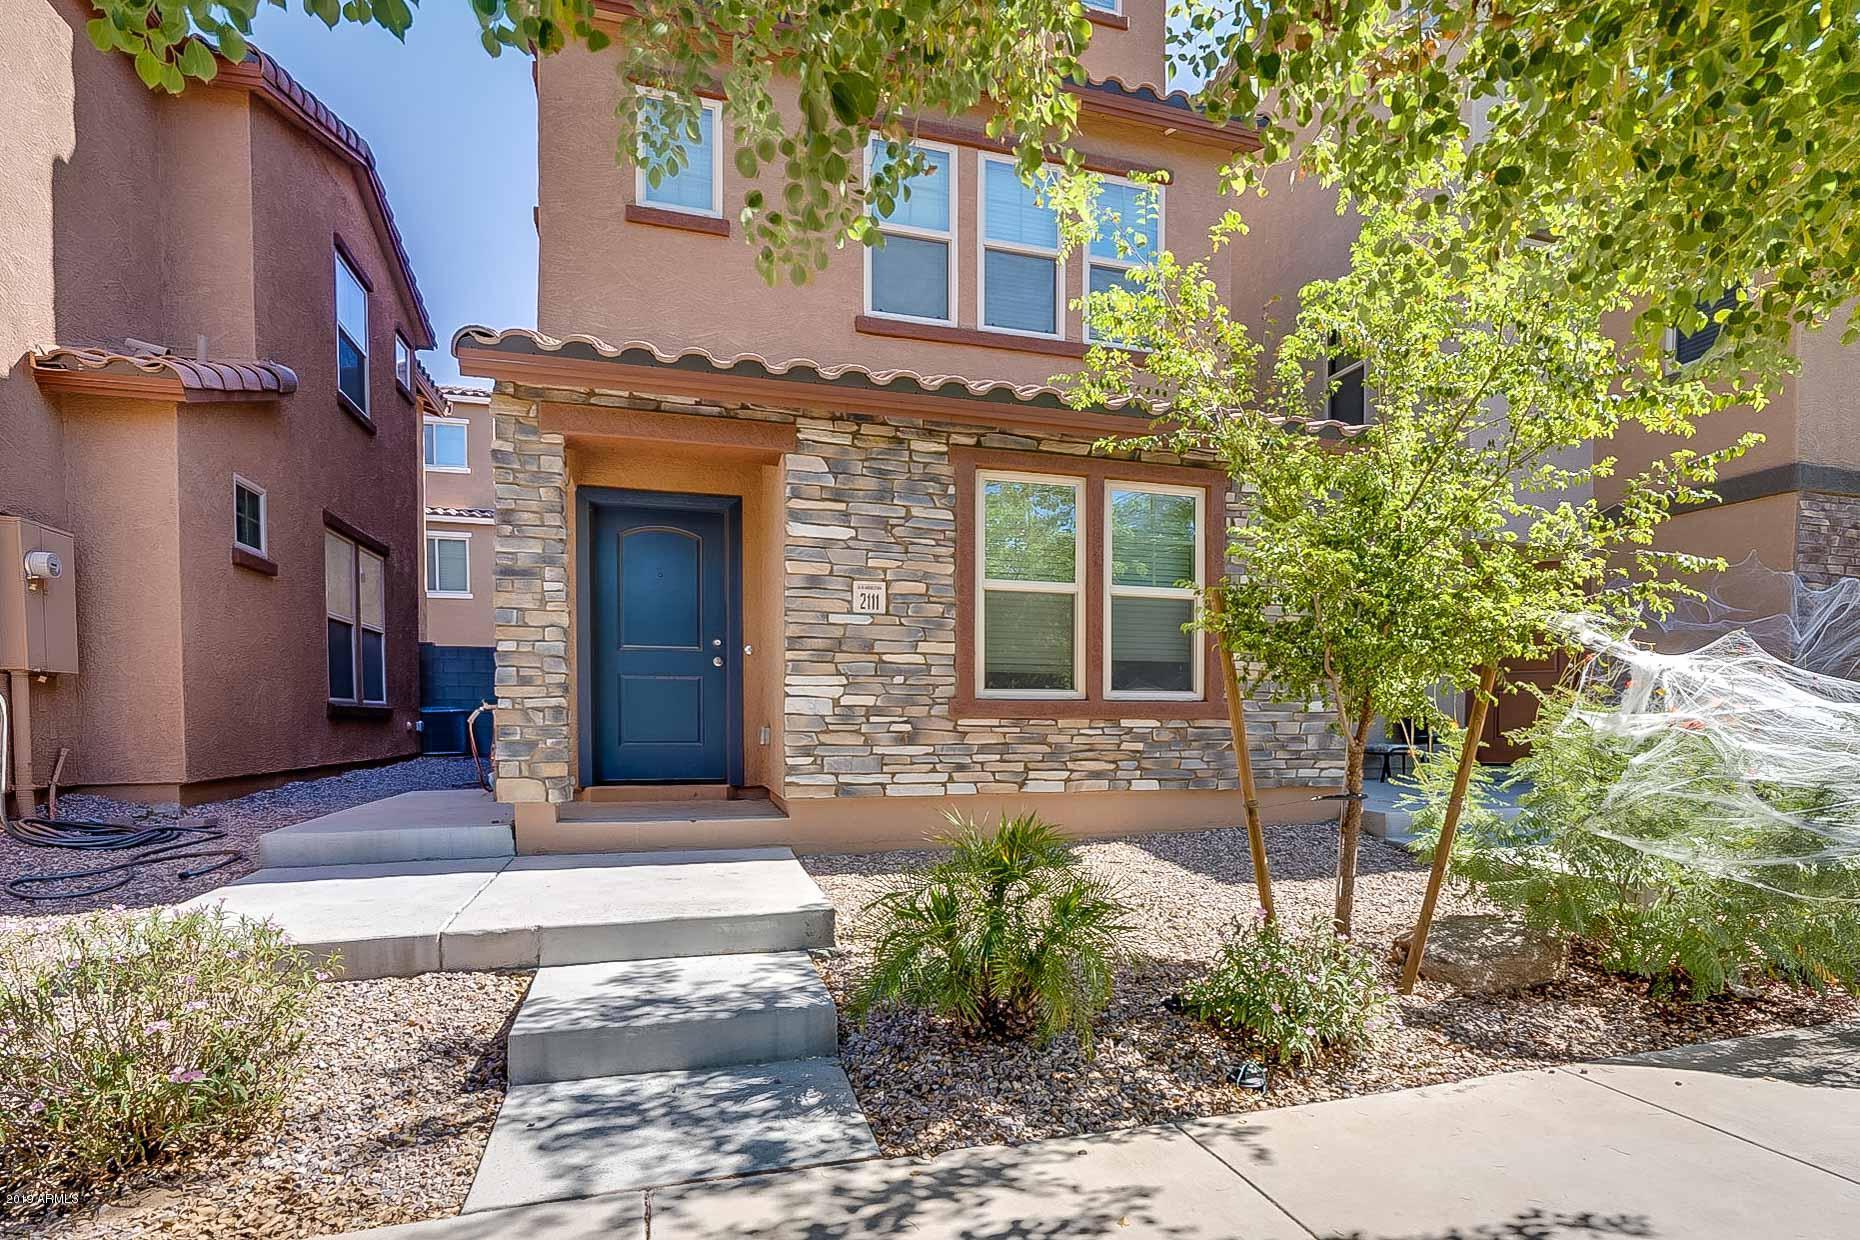 Photo of 2111 N 77TH Glen, Phoenix, AZ 85035